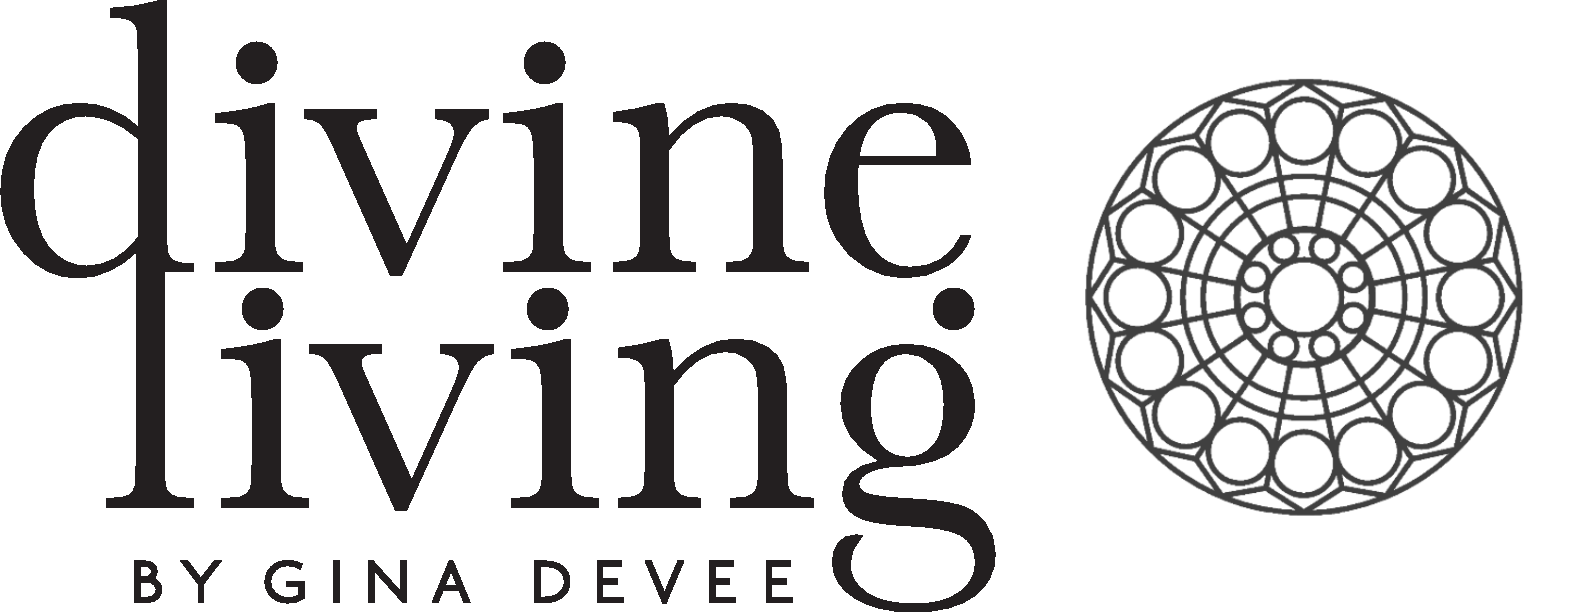 https://www.claire-morgan.com/wp-content/uploads/2019/03/divine-living-logo.png